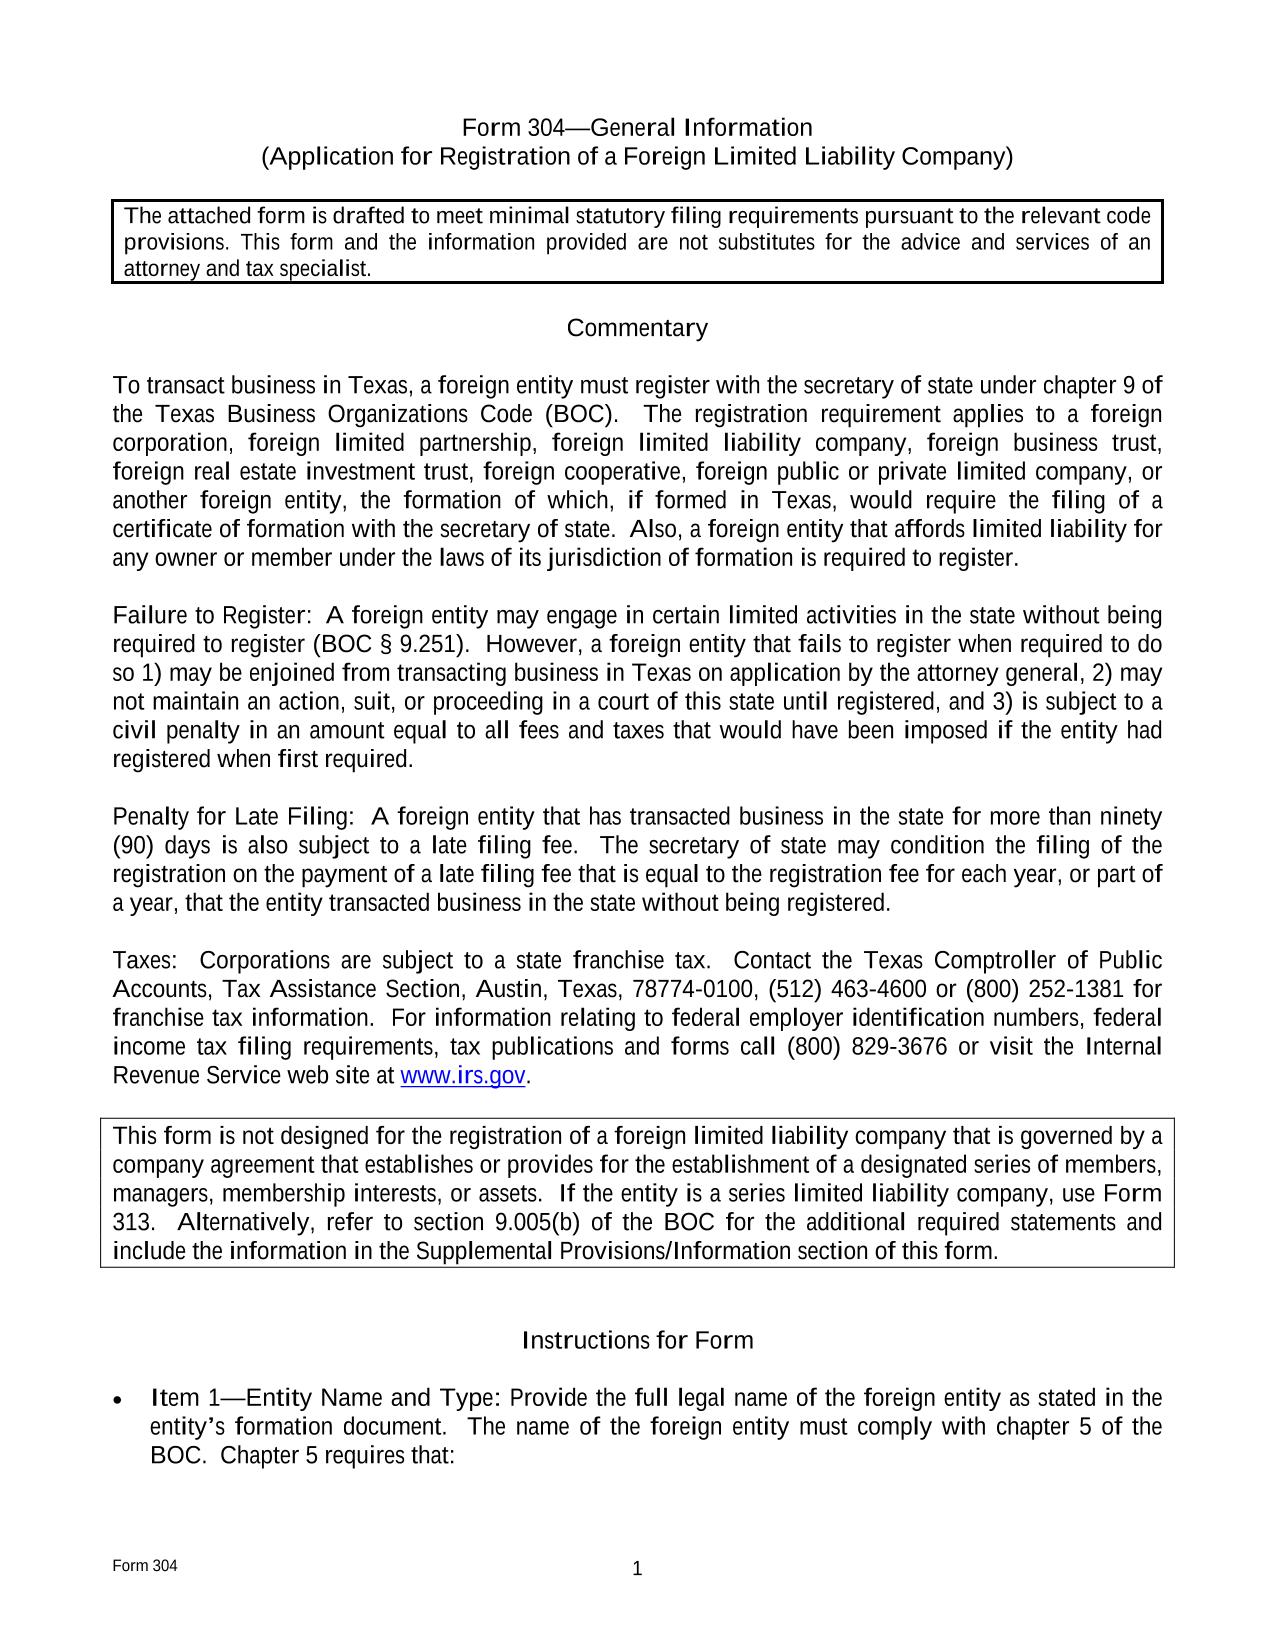 texas-foreign-llc-application-for-registration